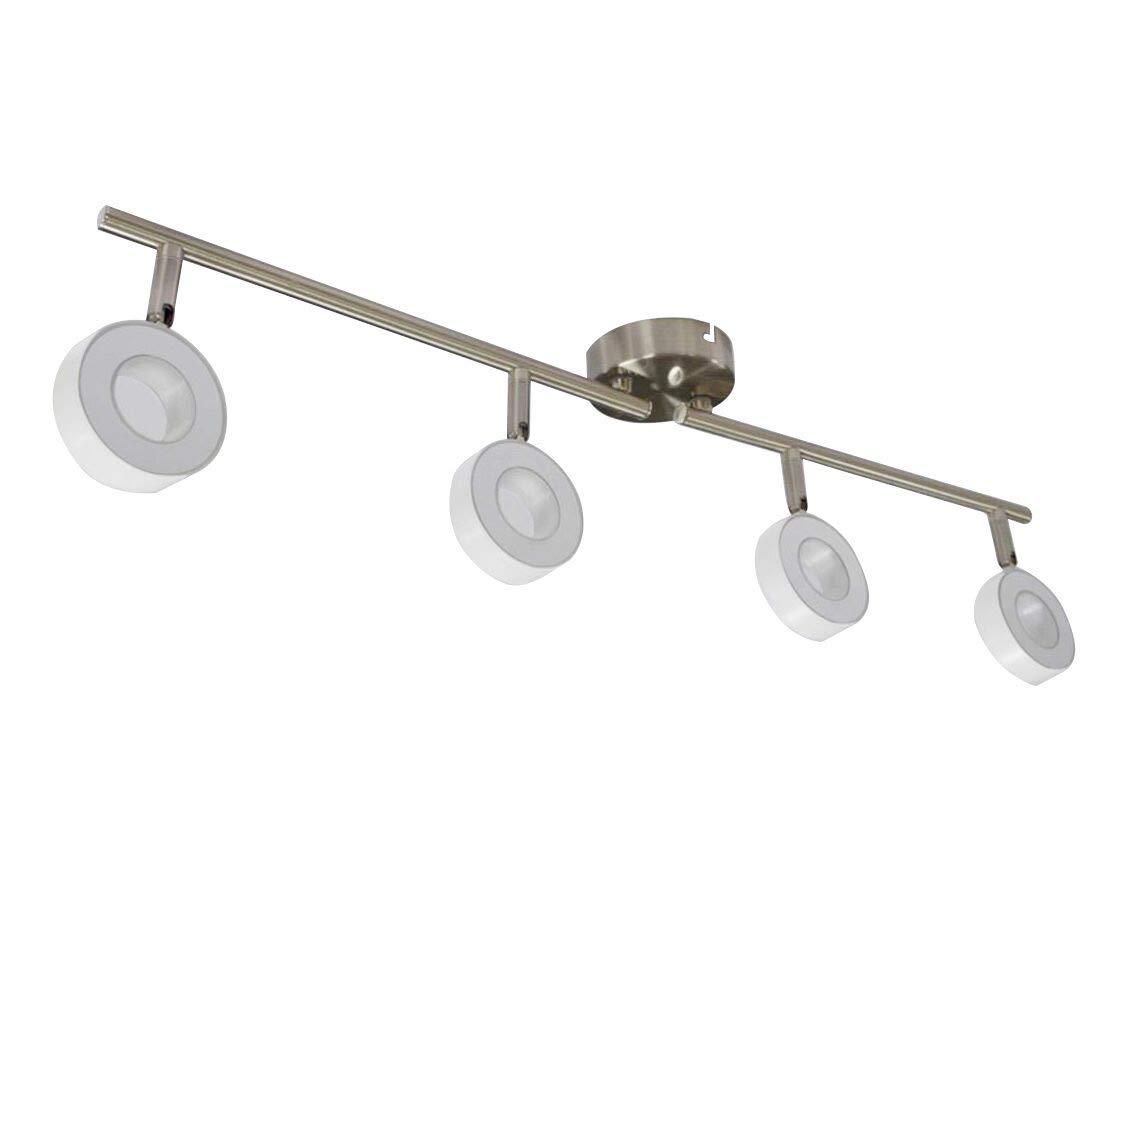 LED Ceiling Spotlights for Kitchen, Eye-Care Ceiling Spot Lights Bar for Bedroom Modern Chrome Rotatable Display Lighting 4 x 3 W GU10 Bulbs Warm White [Energy Class A++] [Energy Class A++] W-LITE